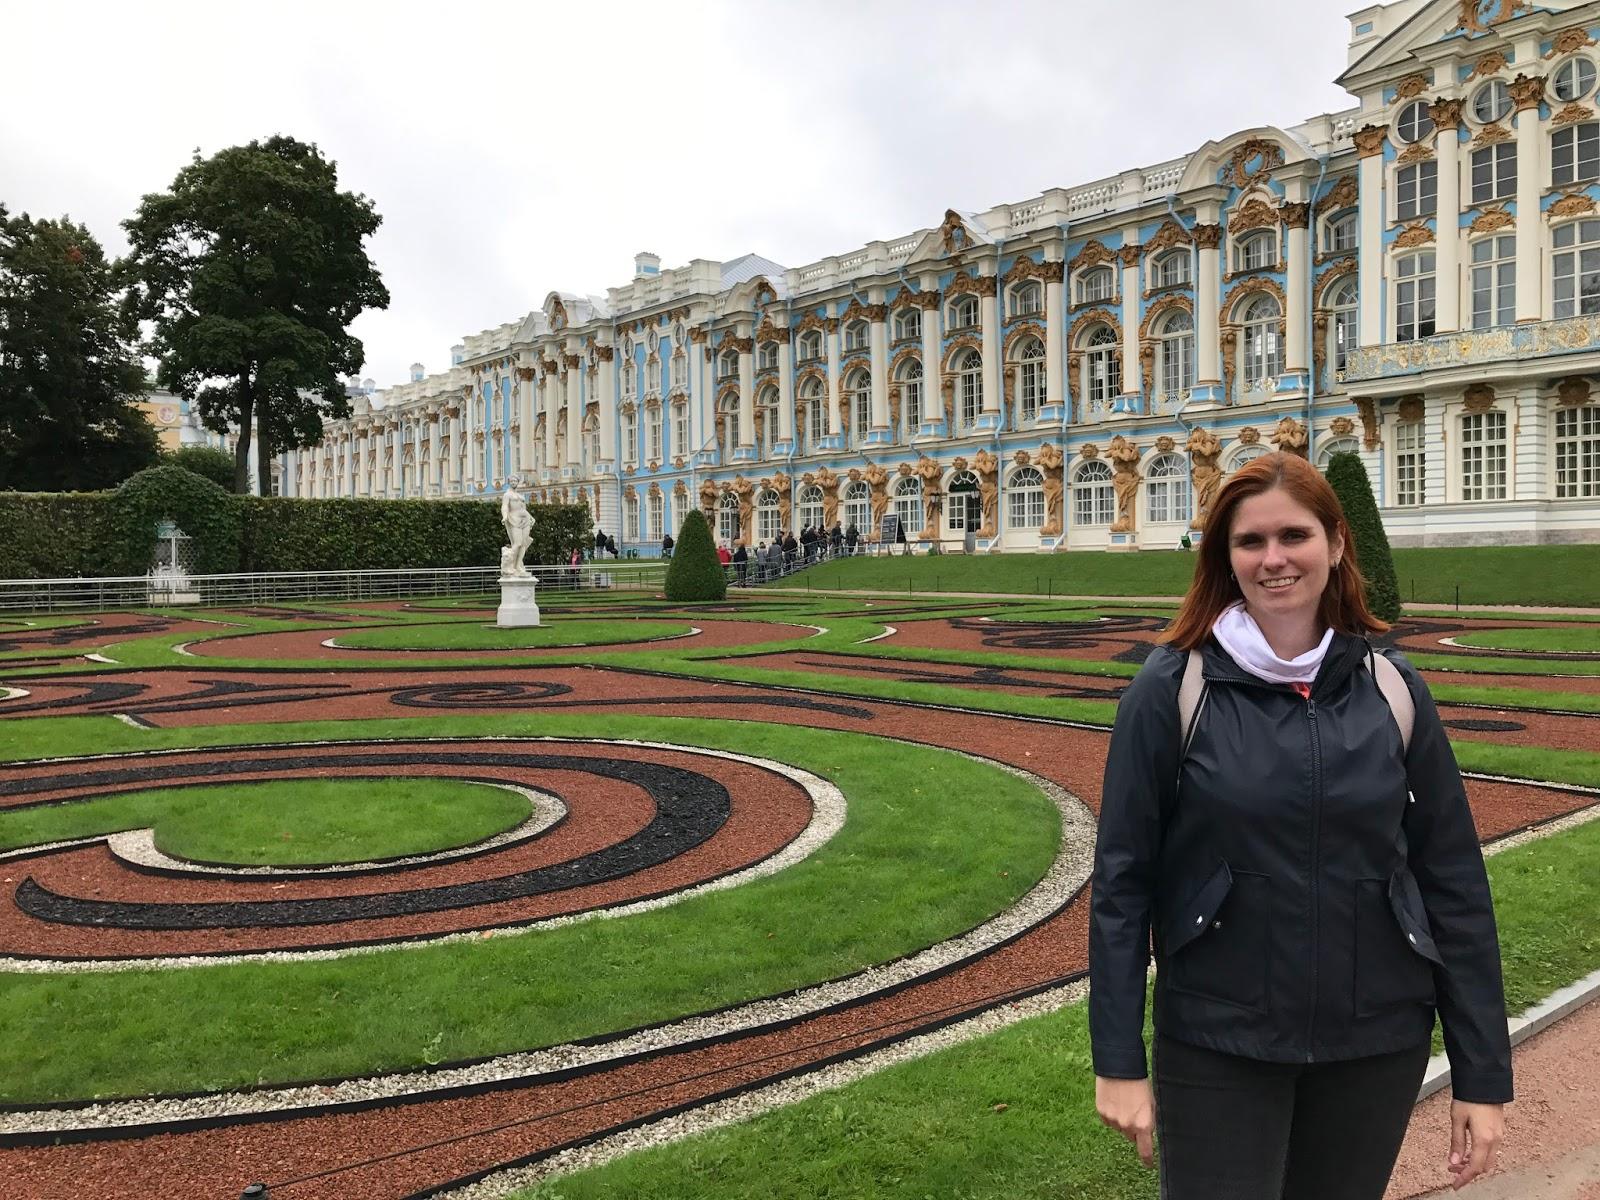 Jardins do Palácio da Catarina